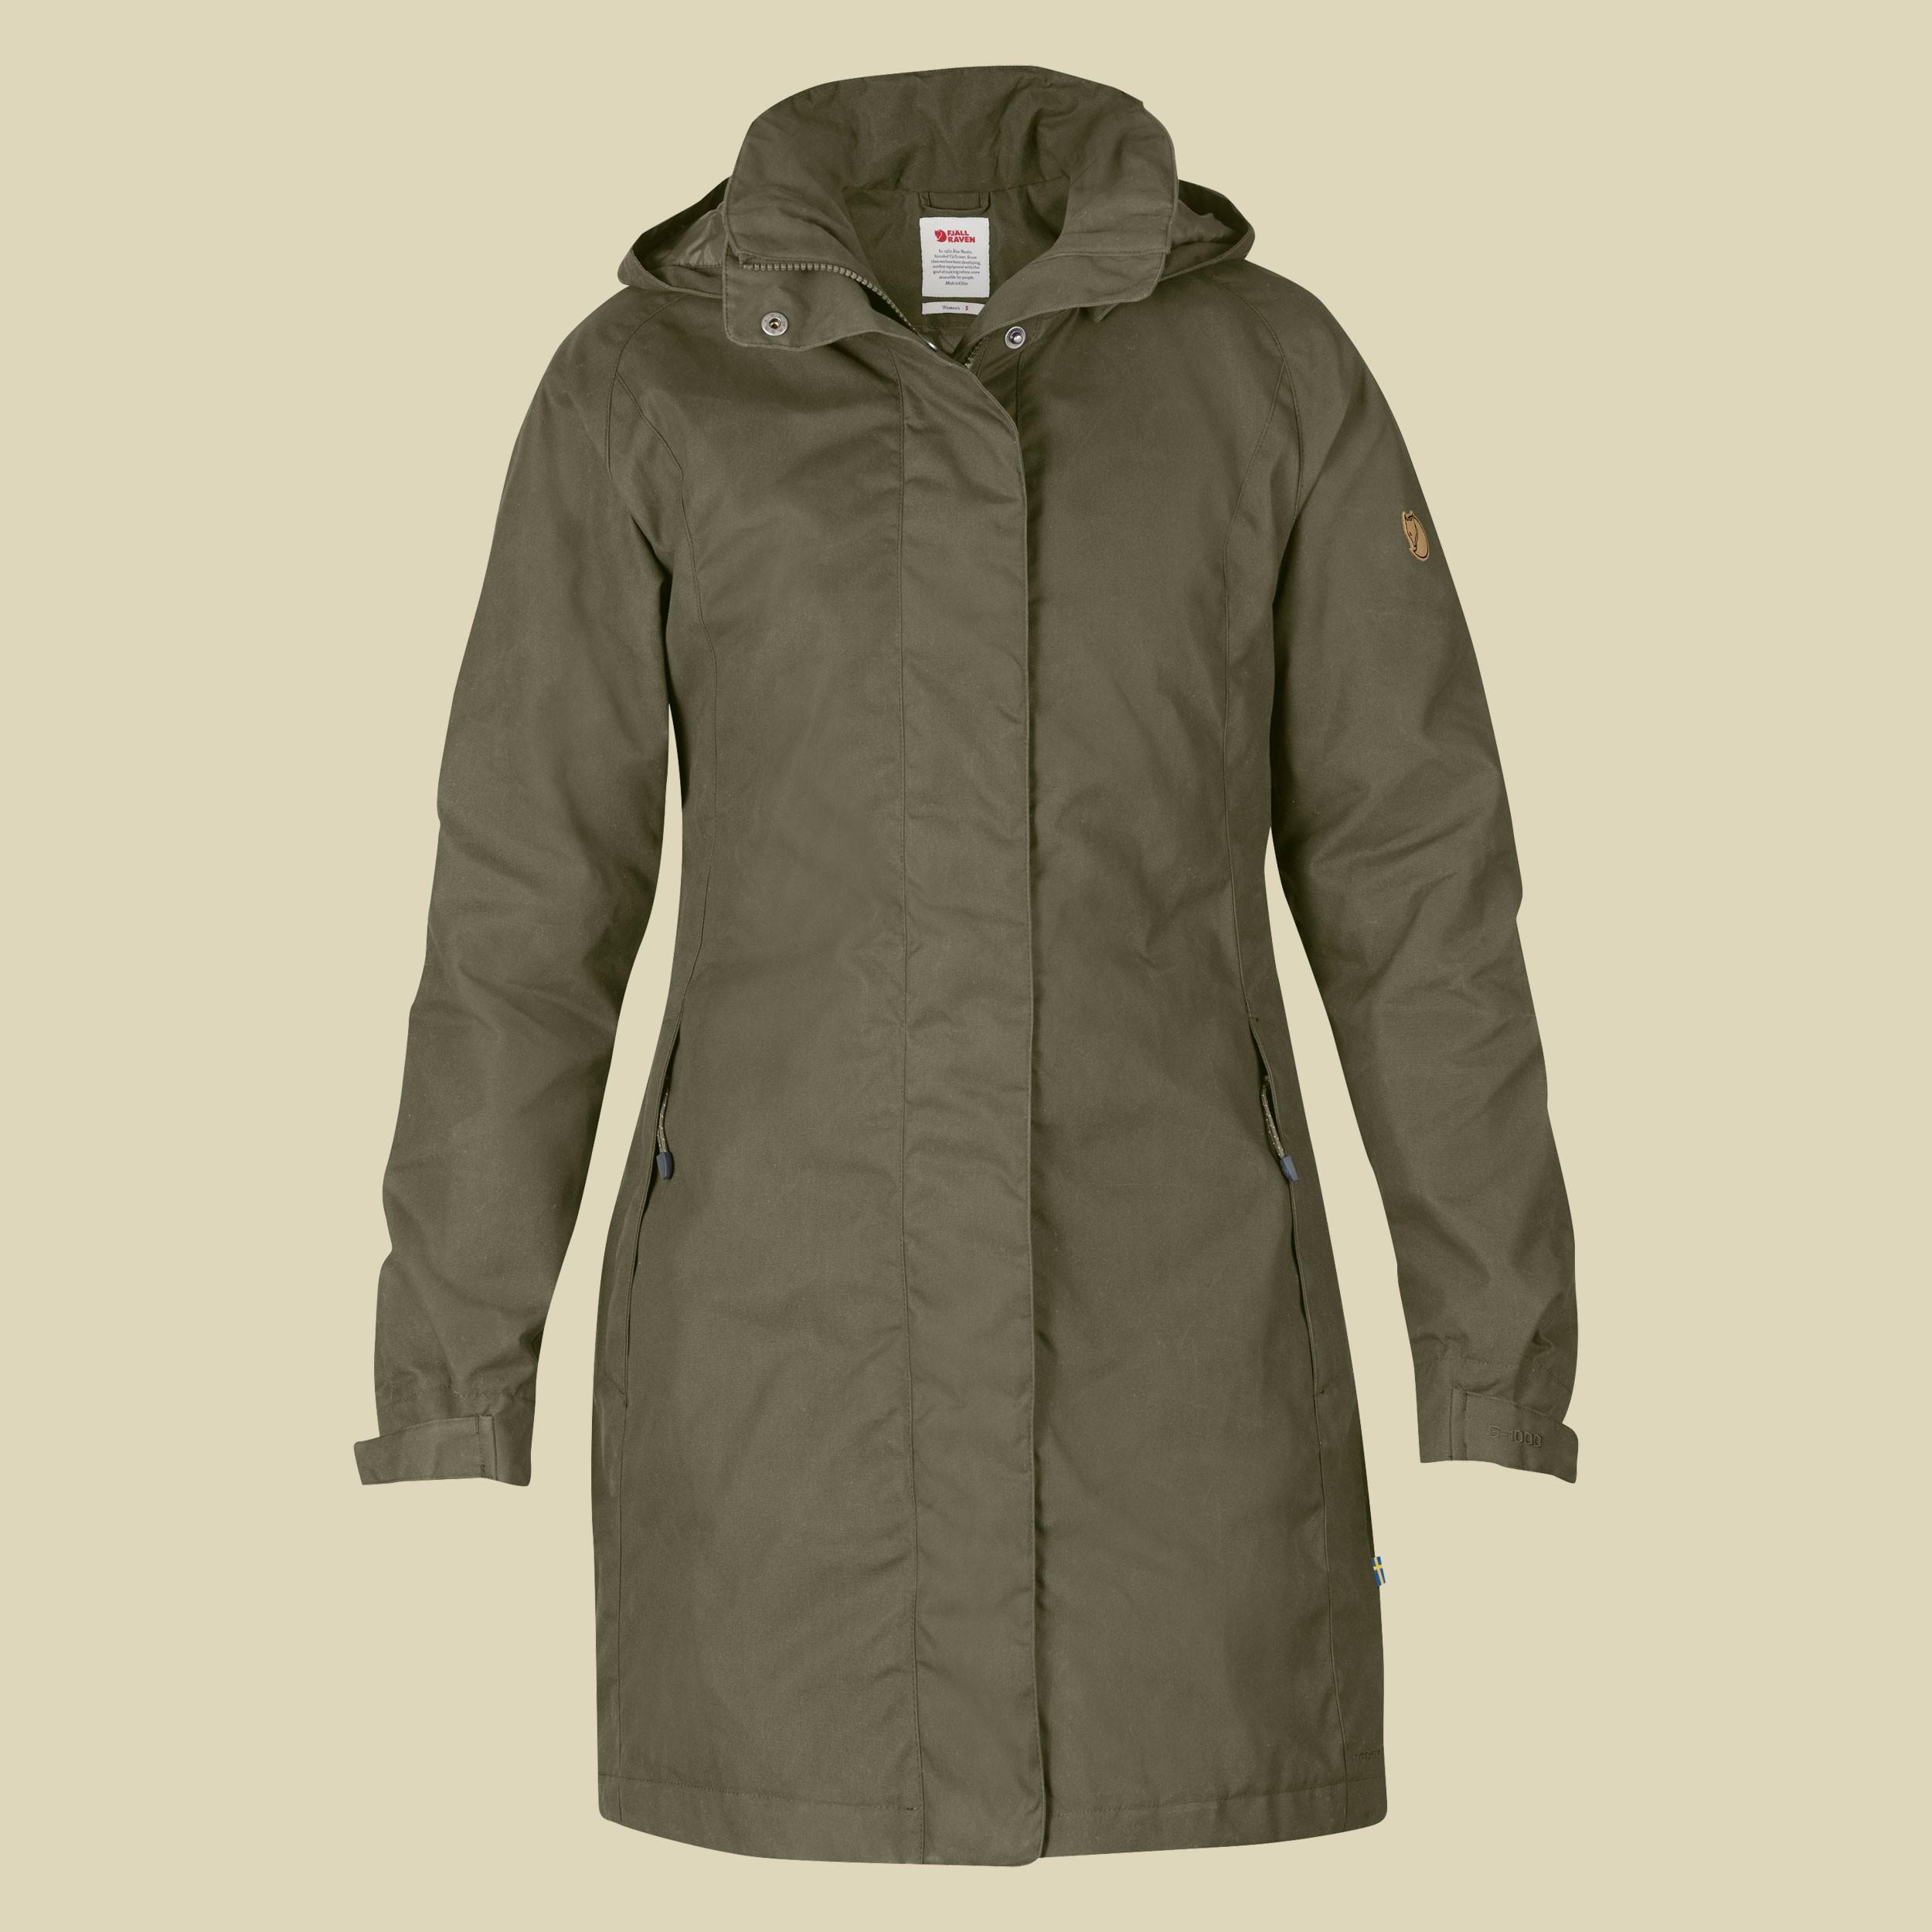 4385ea5c6d6cad Fjällräven Una Jacket Women - Winterjacke Damen - naturzeit